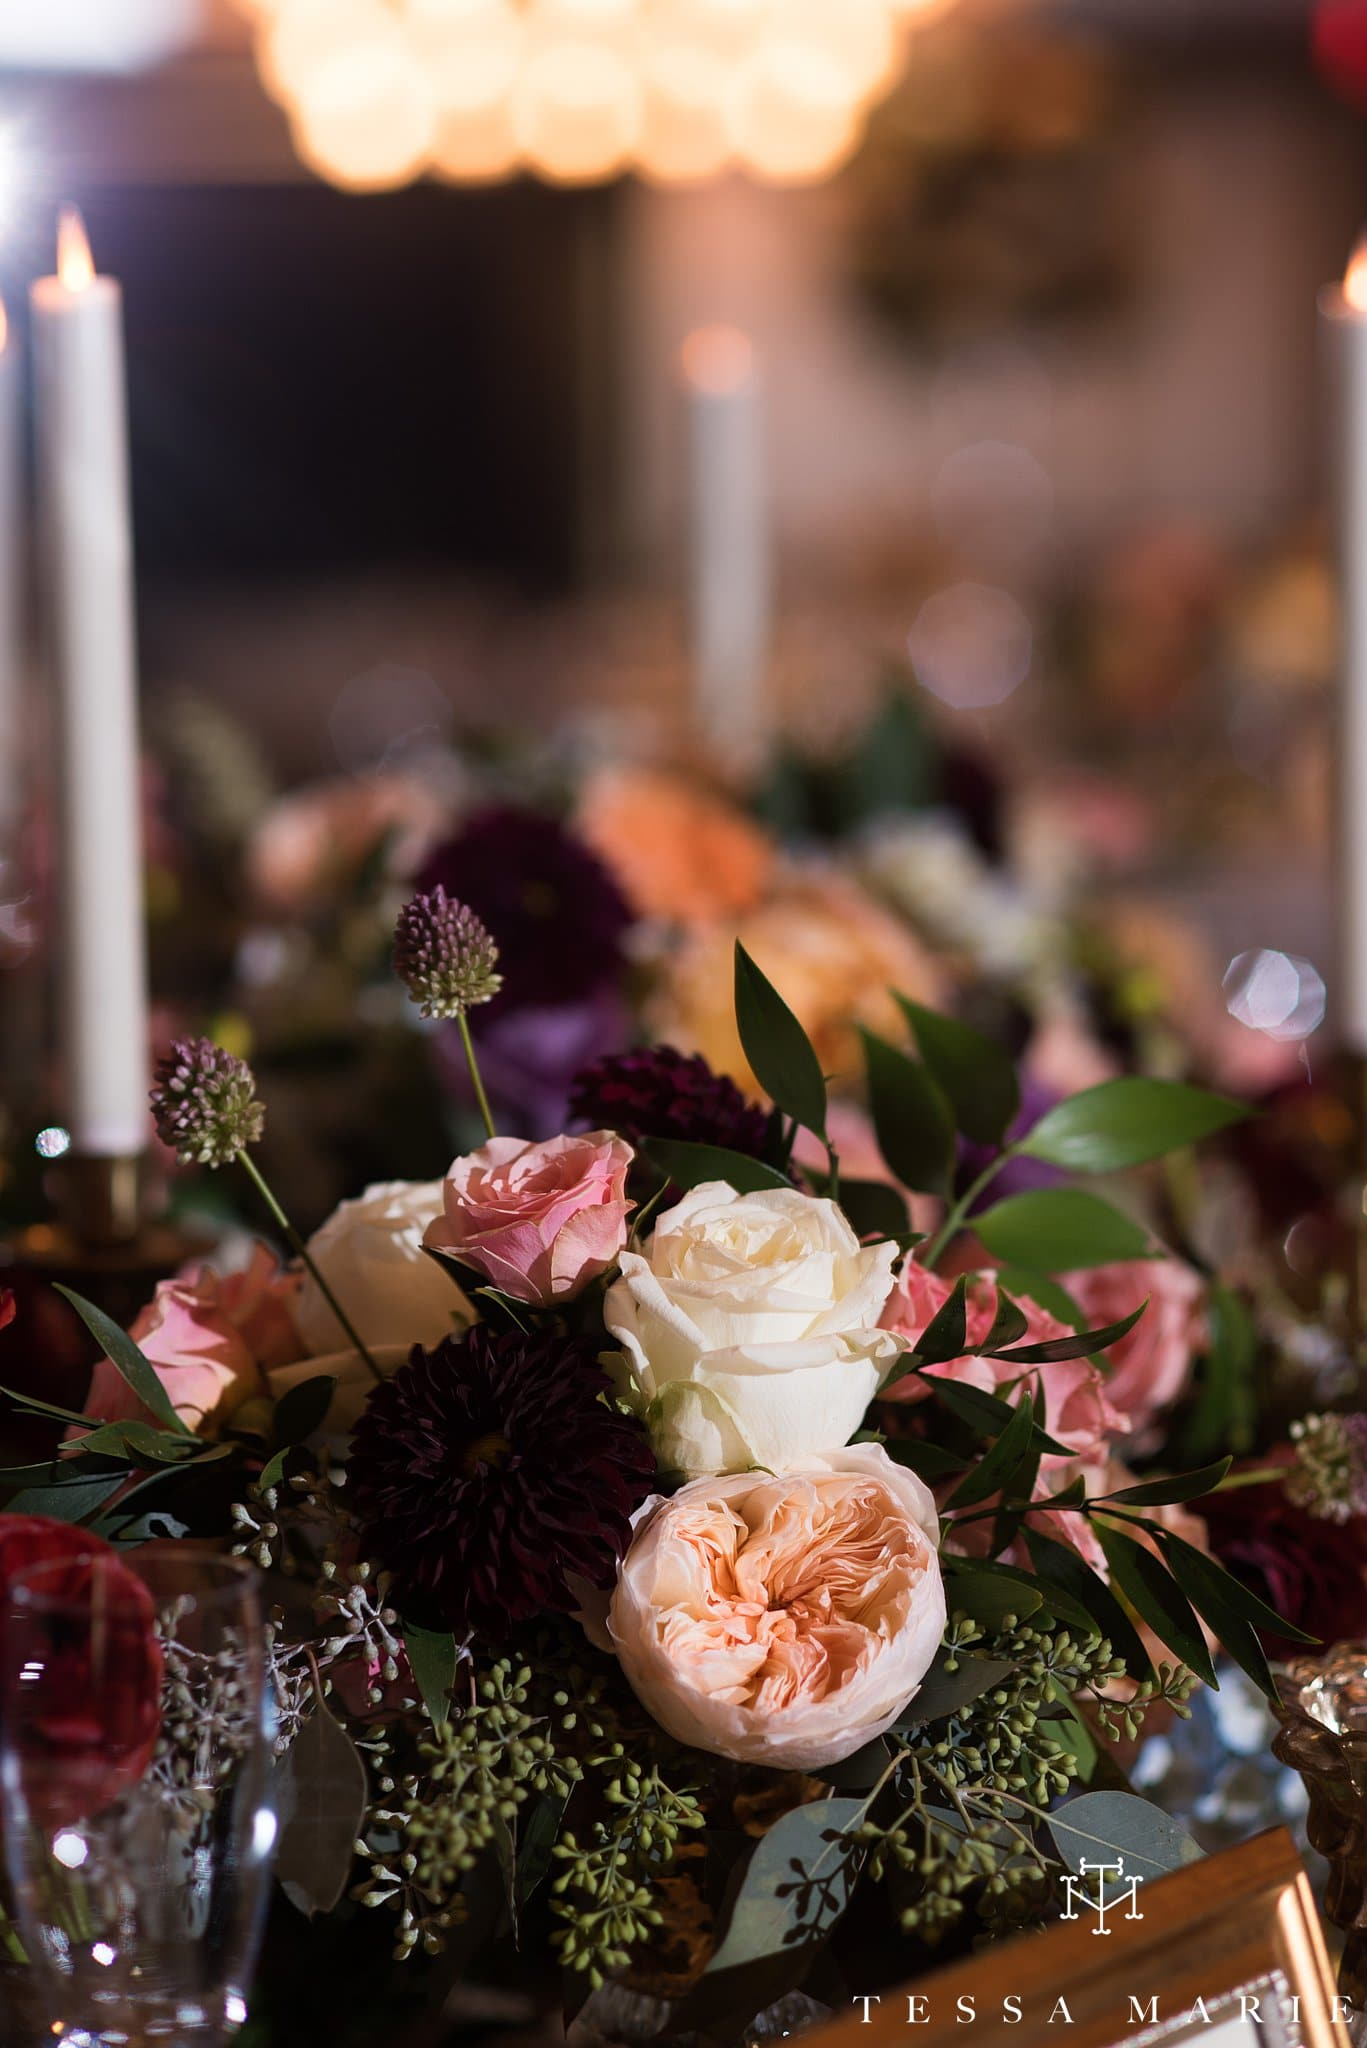 tessa_marie_Weddings_four_seasons_rehersal_dinner_pictures_wedding_atlanta_wedding_getting_married_0011.jpg